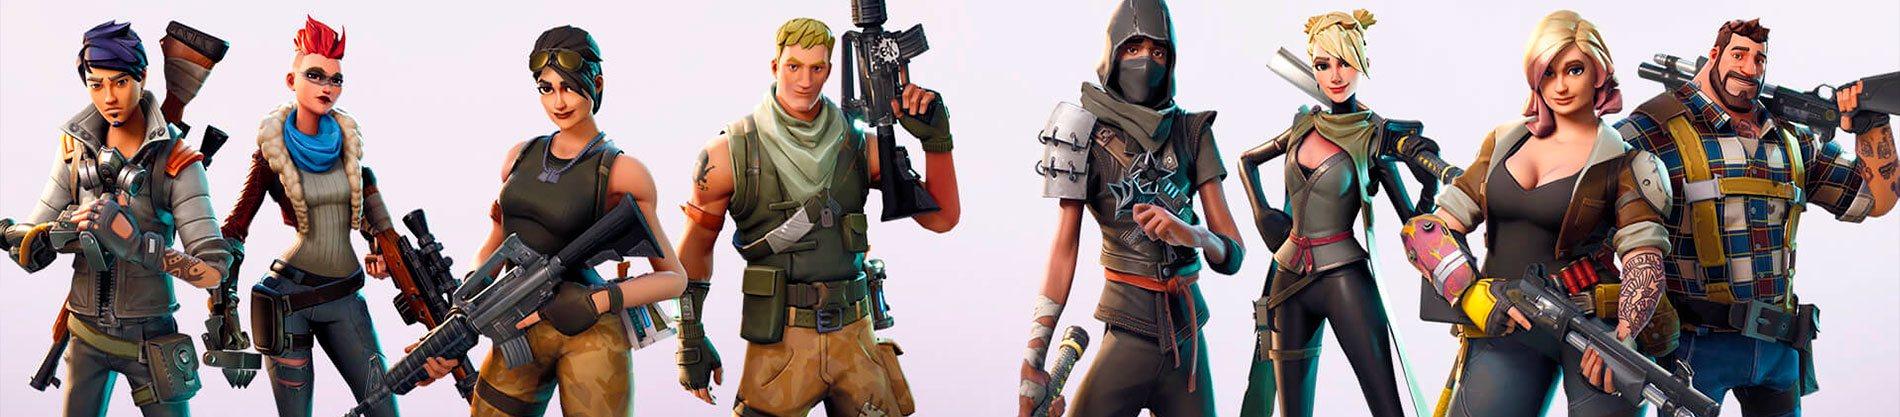 Los 10 mejores skins del videojuego Fortnite